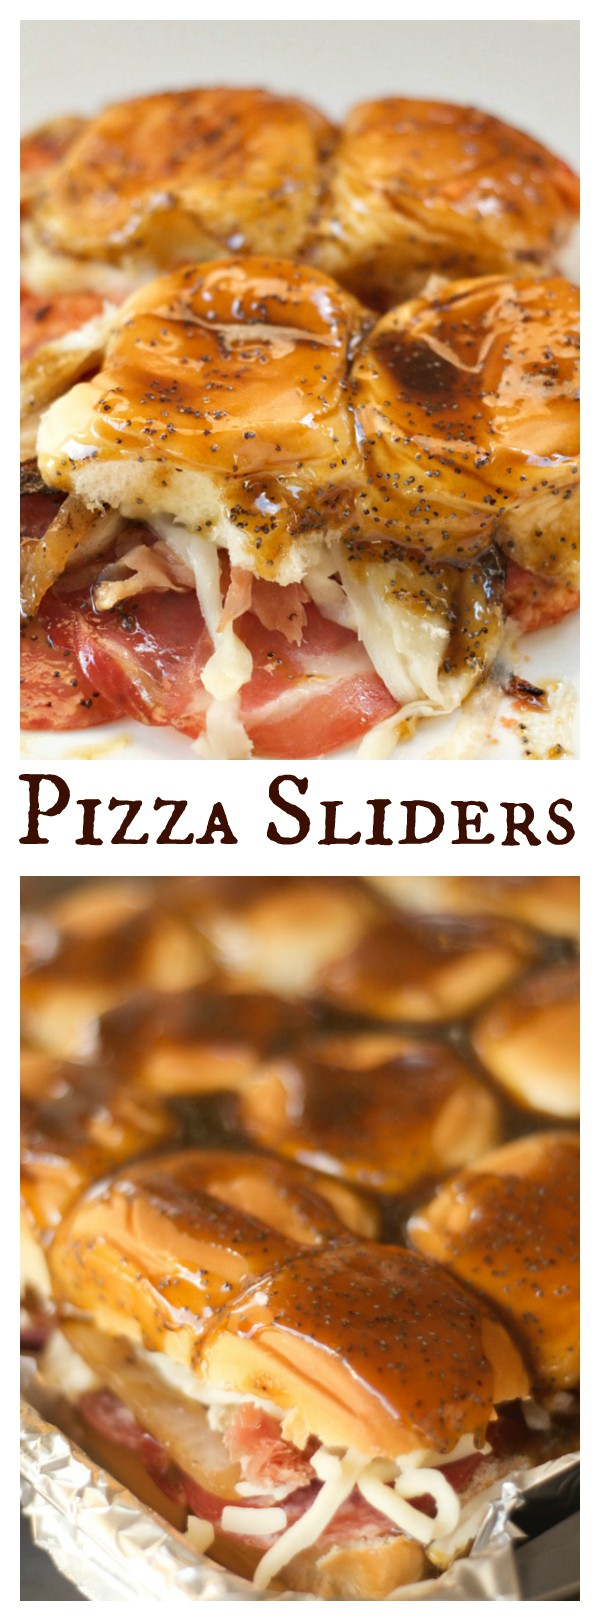 Pizza Sliders ReluctantEntertainer.com